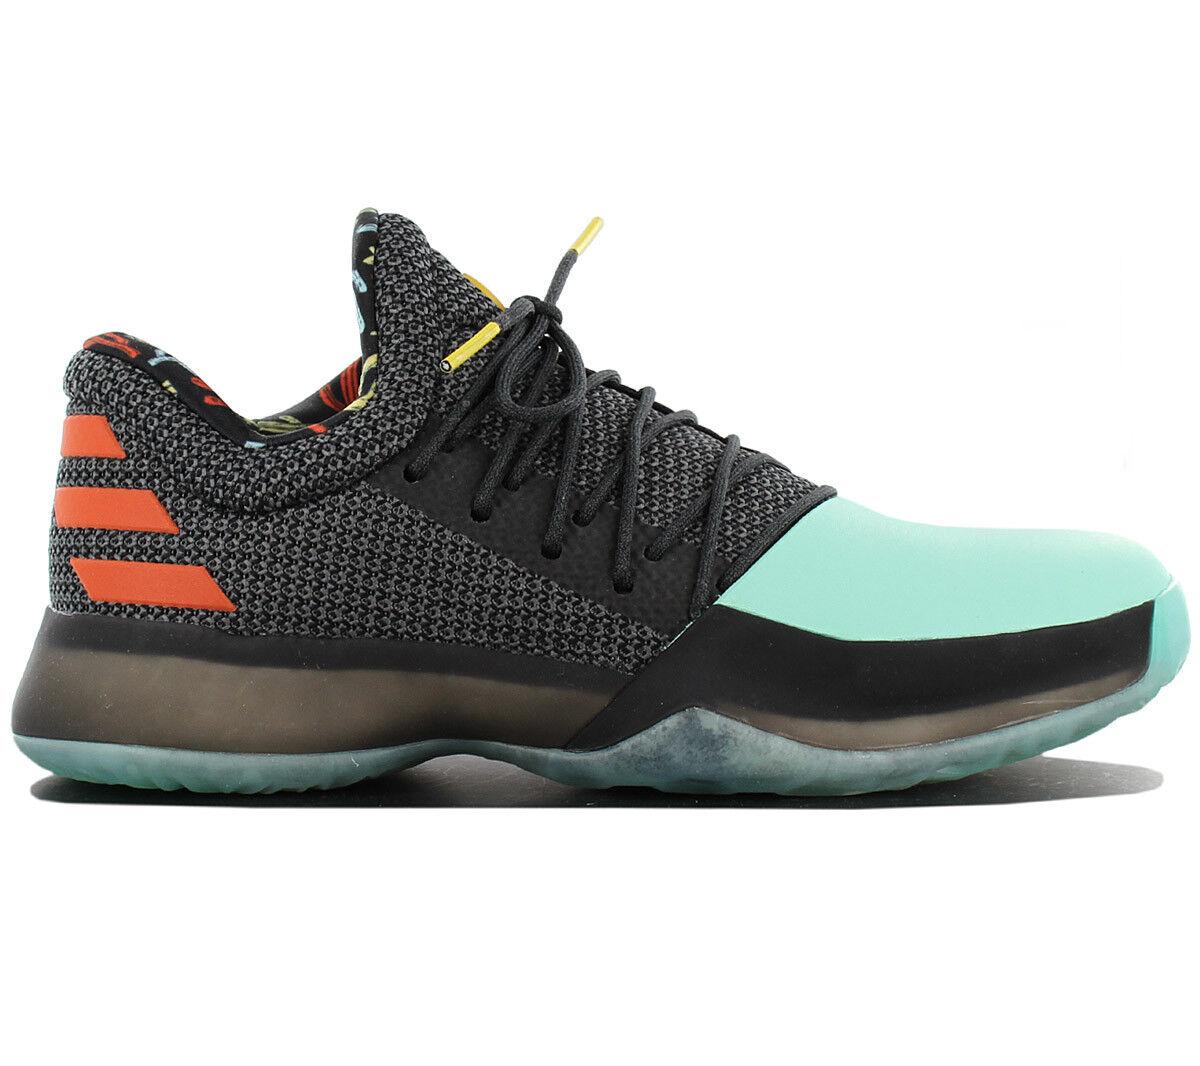 Adidas James Harden Vol.1 Herren Turnschuhe Basketballschuhe BW1573 Turnschuhe NEU